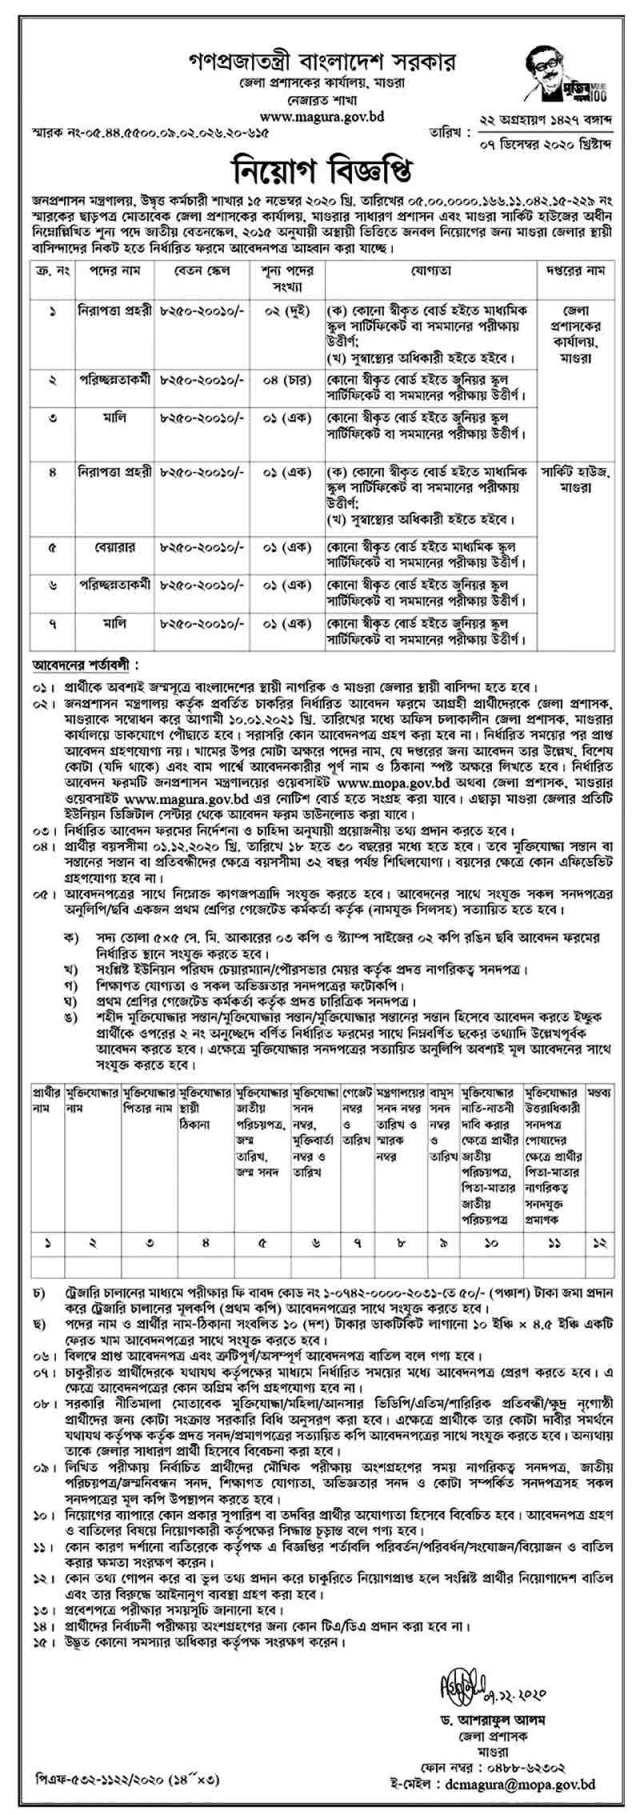 Magura District Commissioner Office Job Circular 2021 (Image)